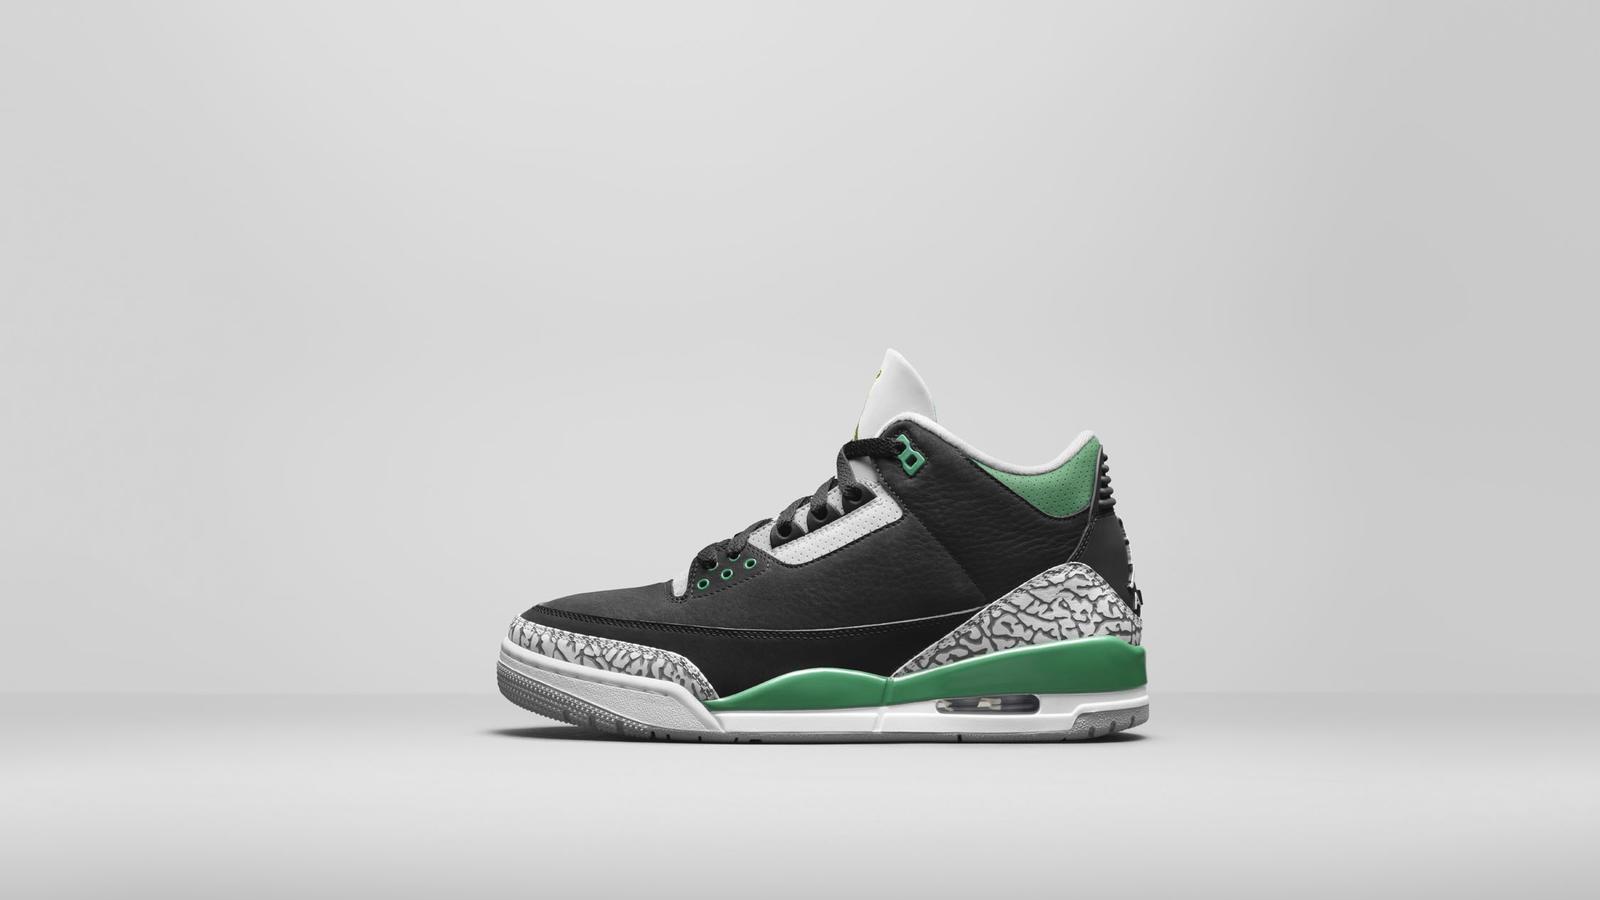 Nike News Jordan Brand Ho21 Retro Preview Aj Iii Retro Ct8532 030 A1 Lateral V02 Lr